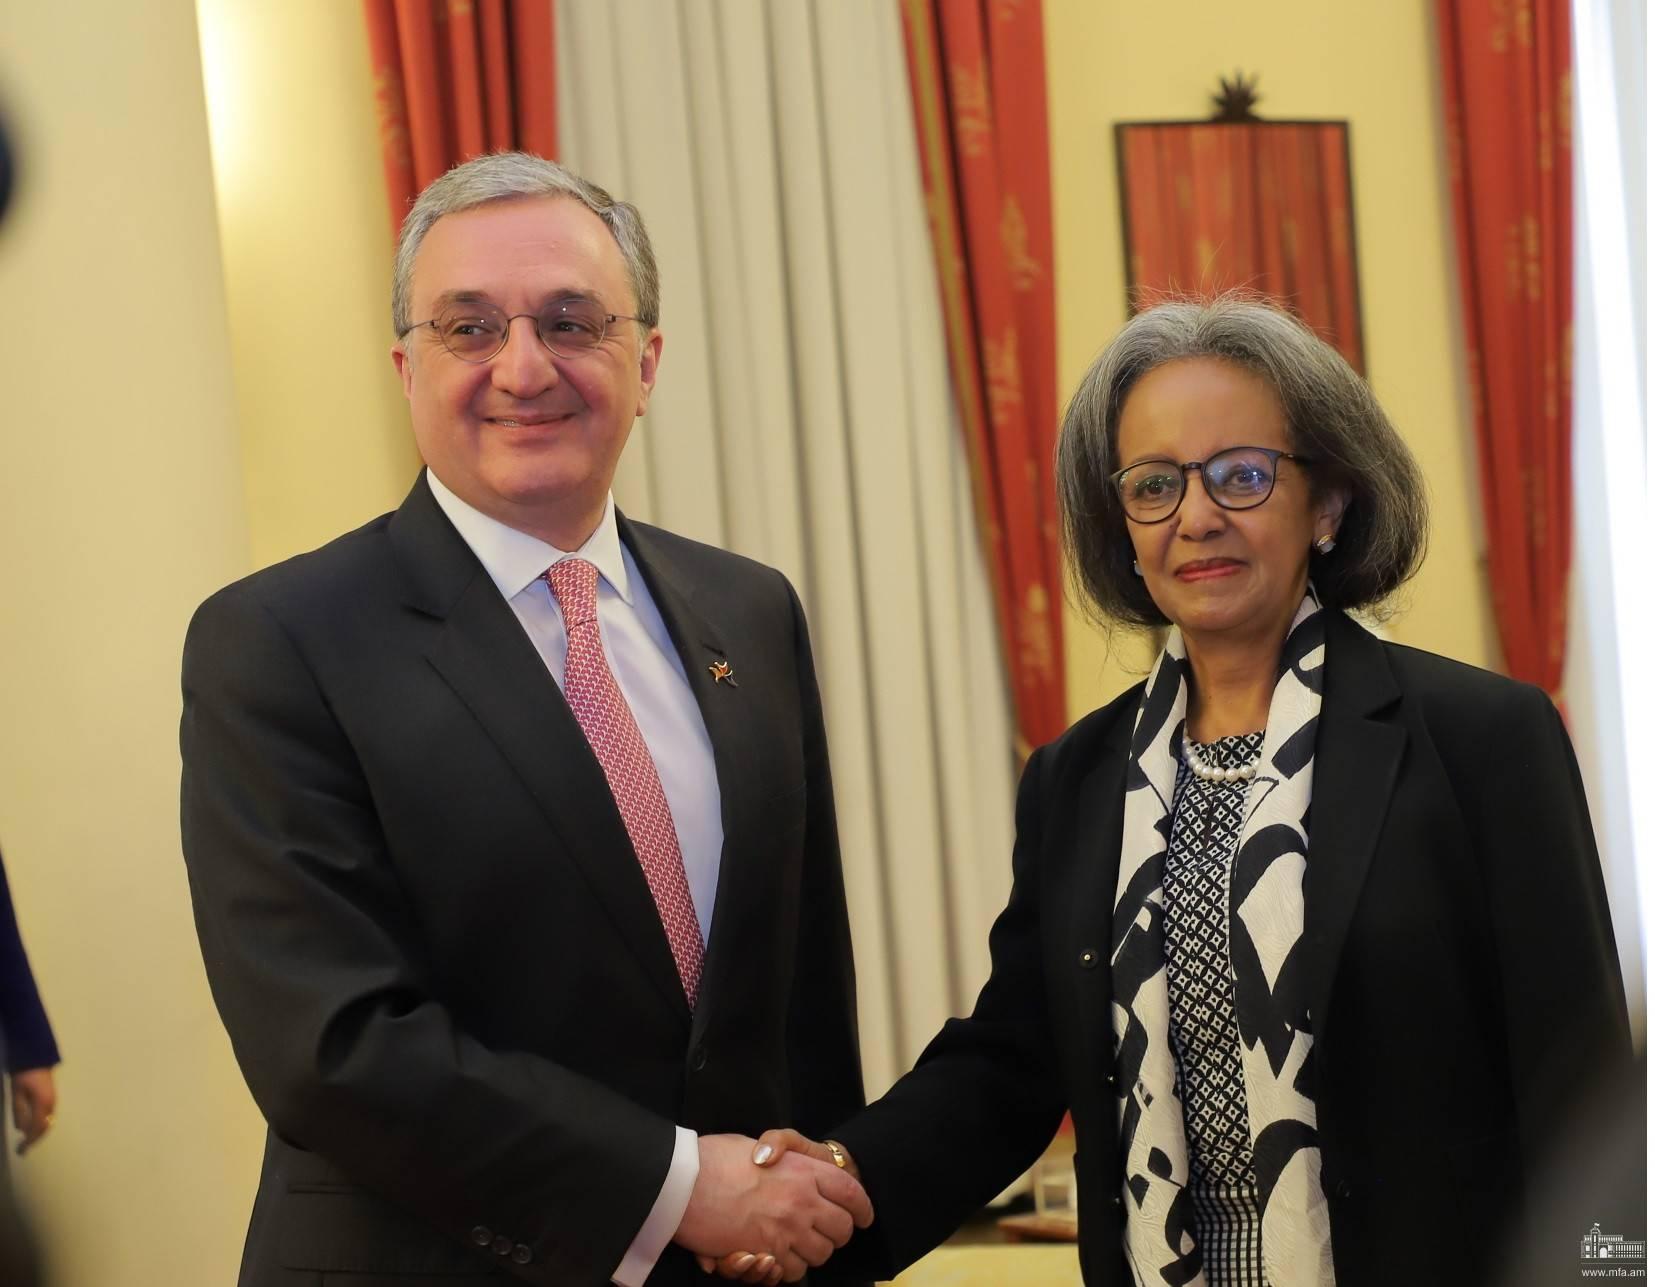 Photo of Մեկնարկեց ԱԳ նախարարի այցը Ադիս Աբեբա. ՀՀ ԱԳ նախարար Զոհրաբ Մնացականյանի հանդիպումը Եթովպիայի նախագահ Սահլե-Վորկ Զևդեի հետ